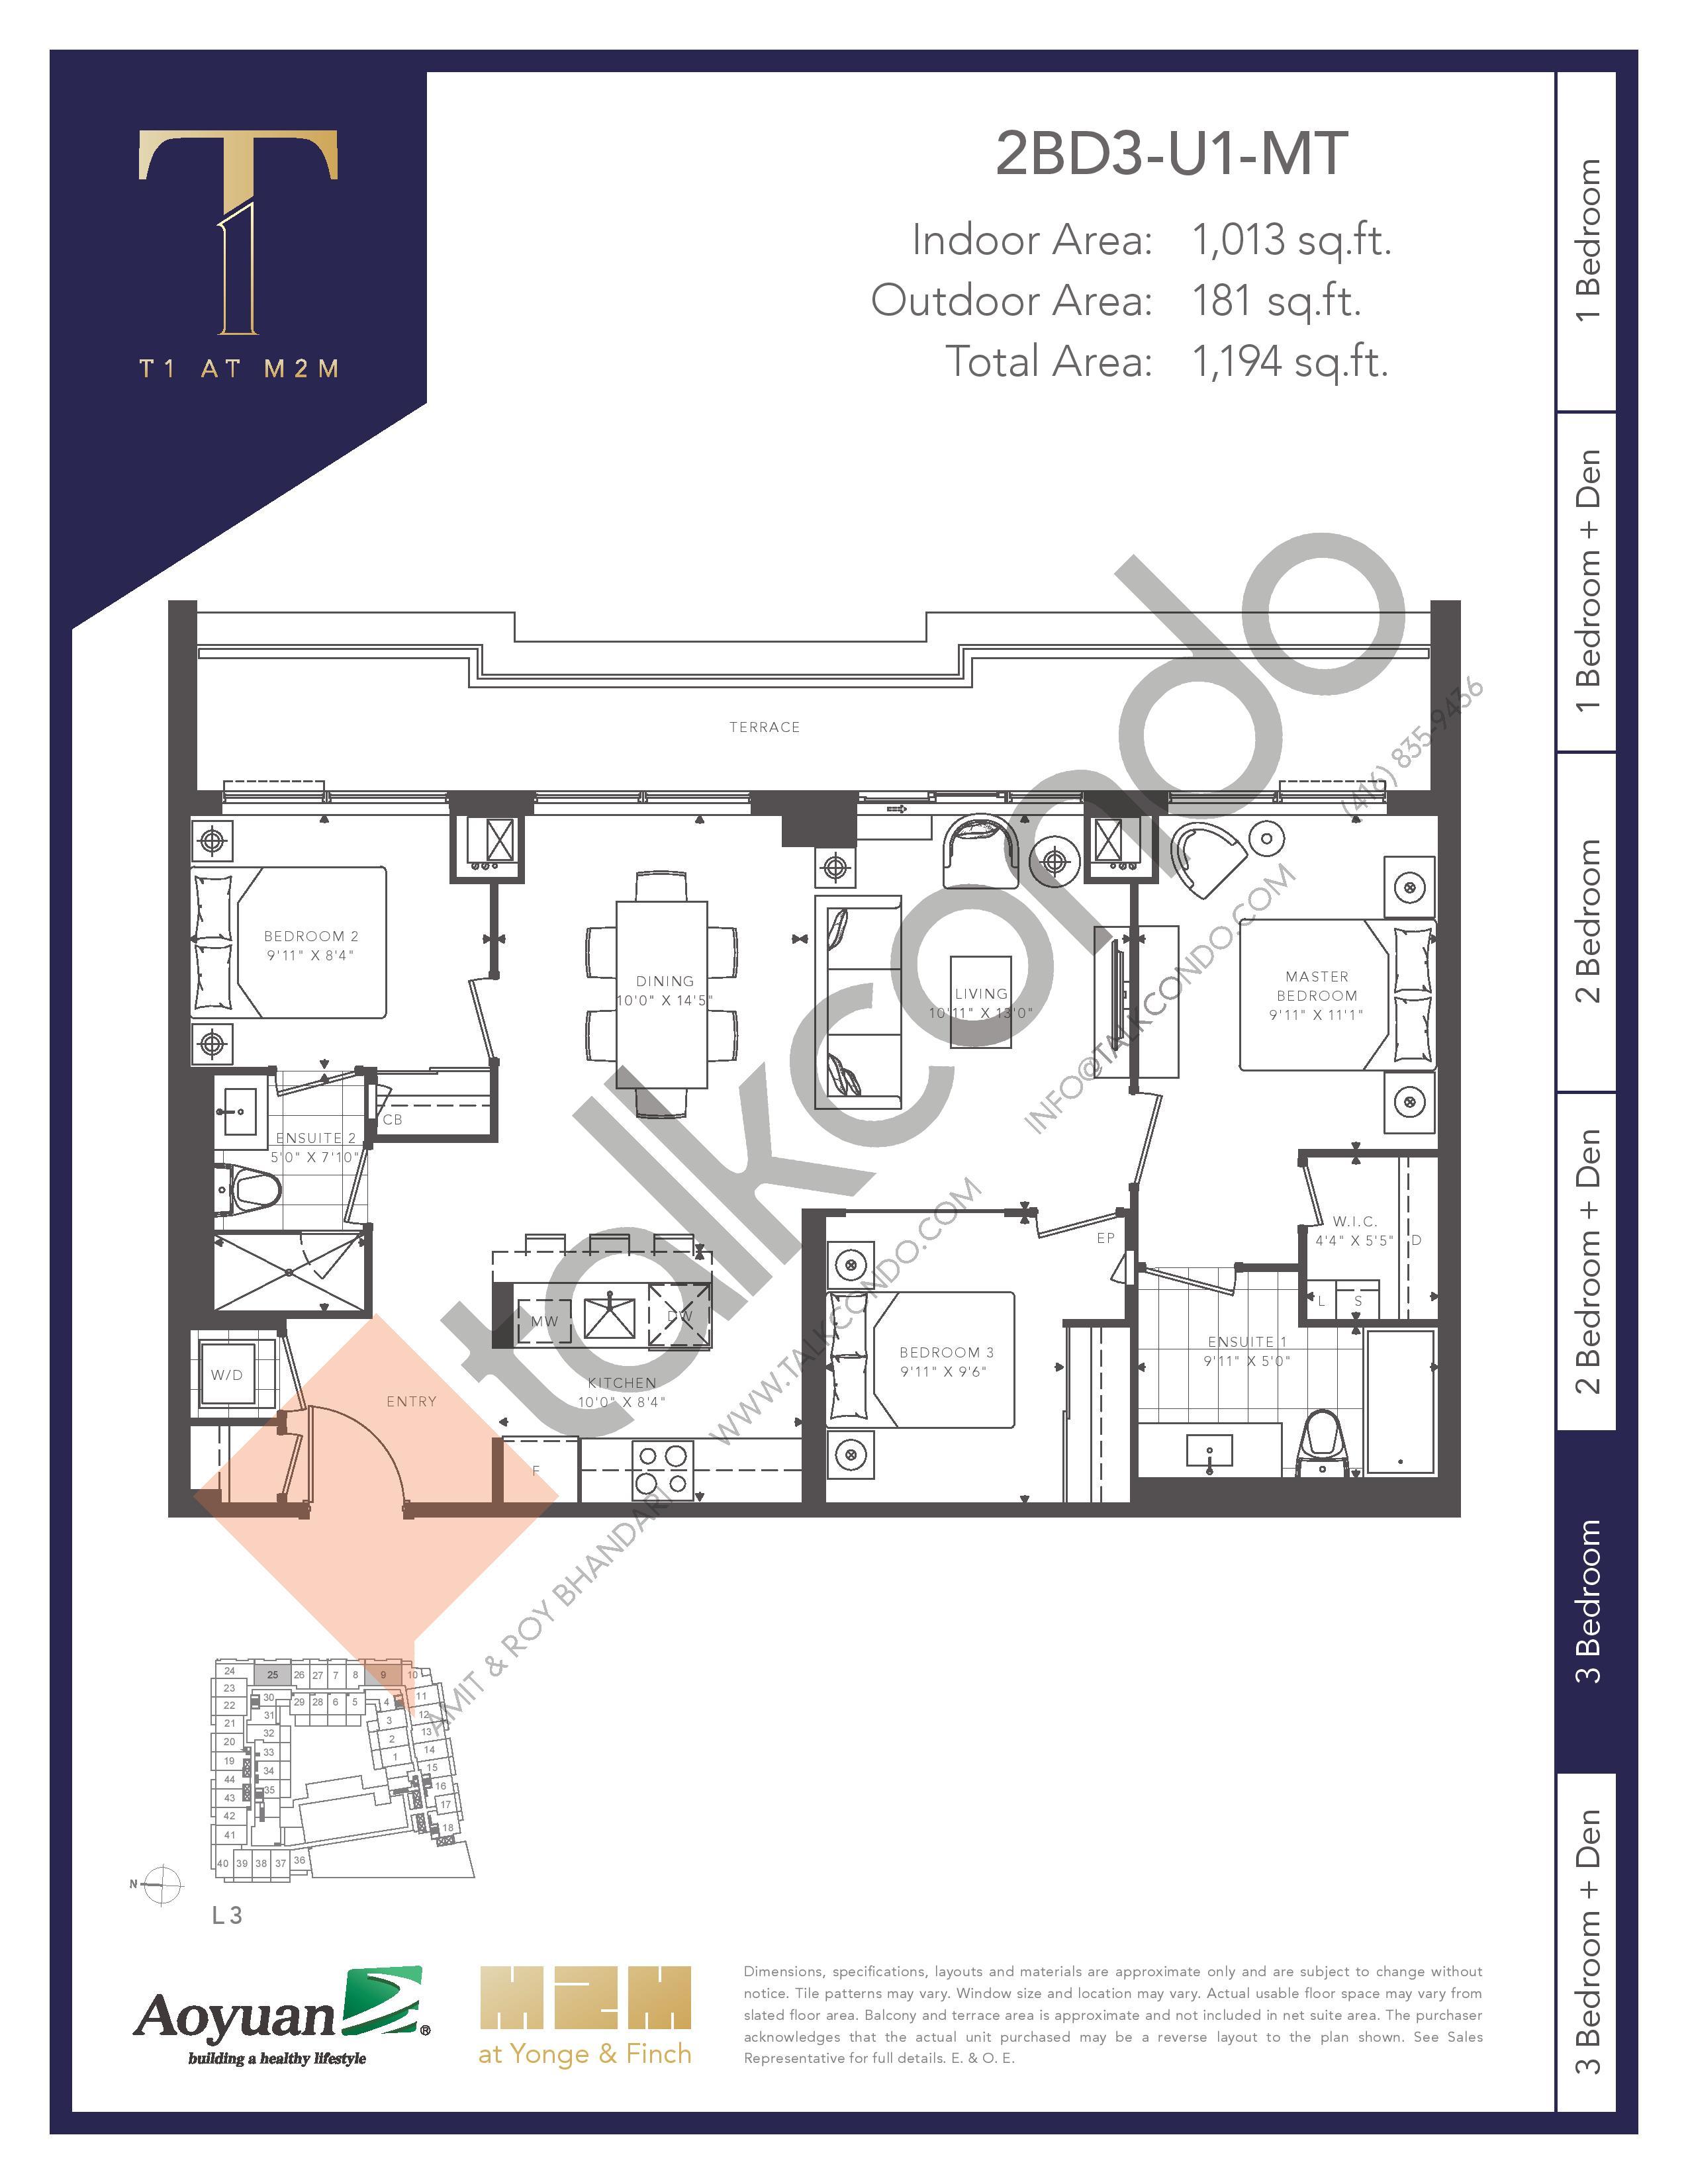 2BD3-U1-MT (Tower) Floor Plan at T1 at M2M Condos - 1013 sq.ft